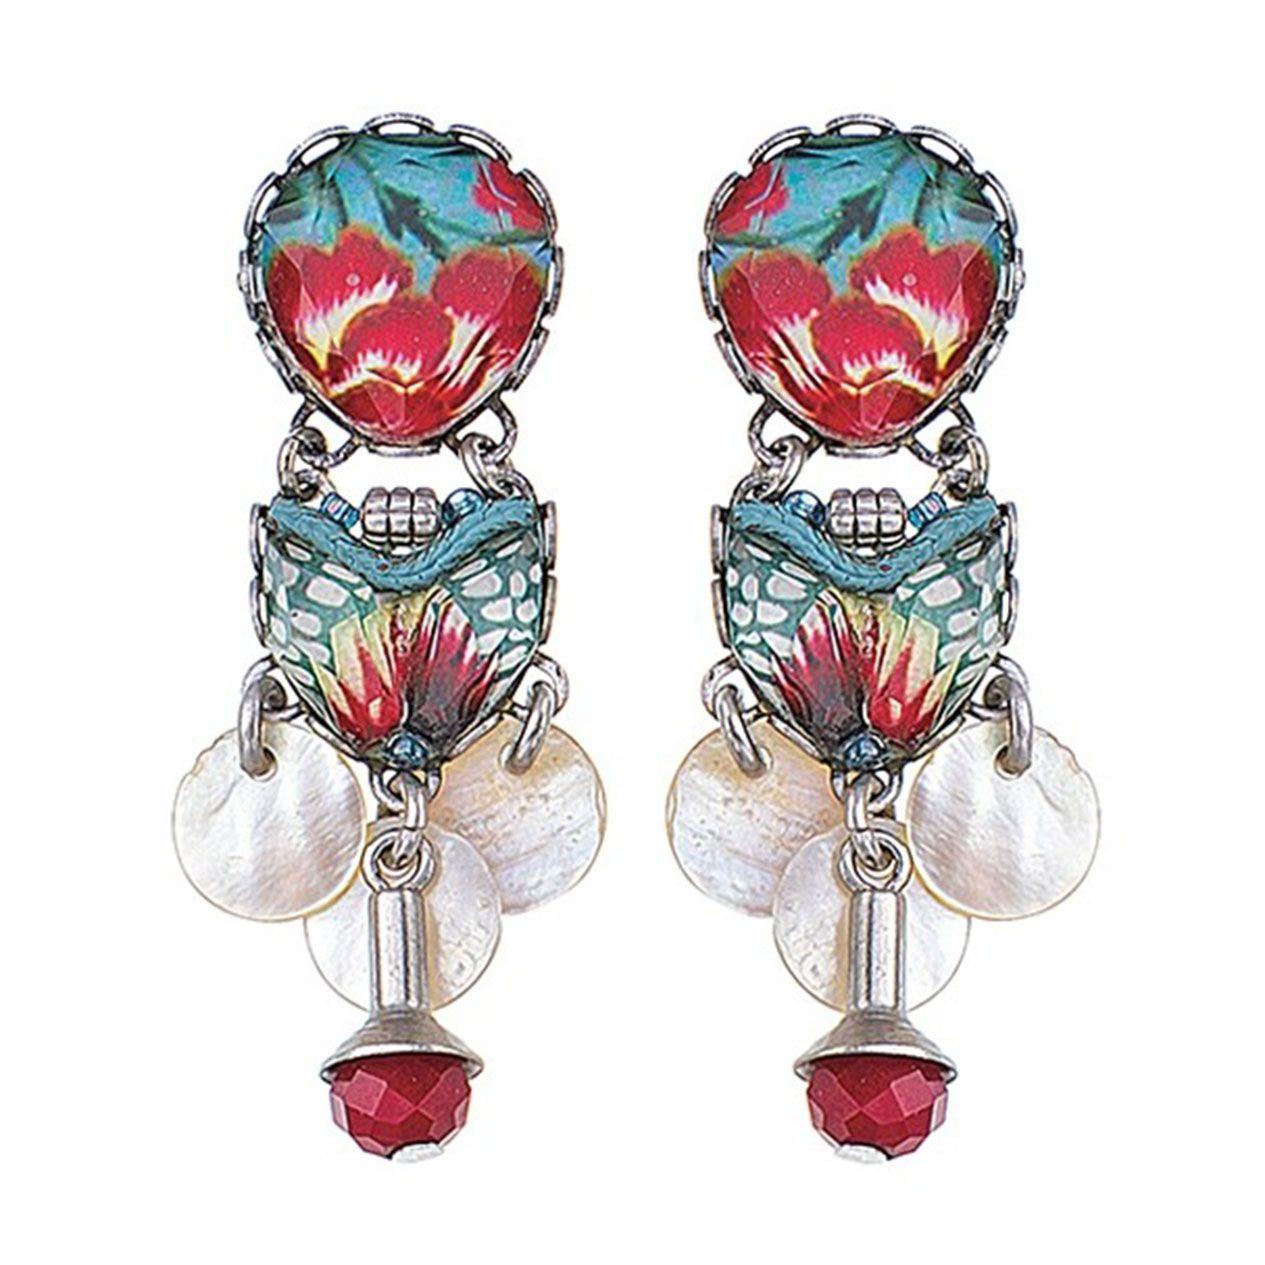 Ayala Bar Israeli Jewelry - Bahia Elision Earrings - Summer 2018